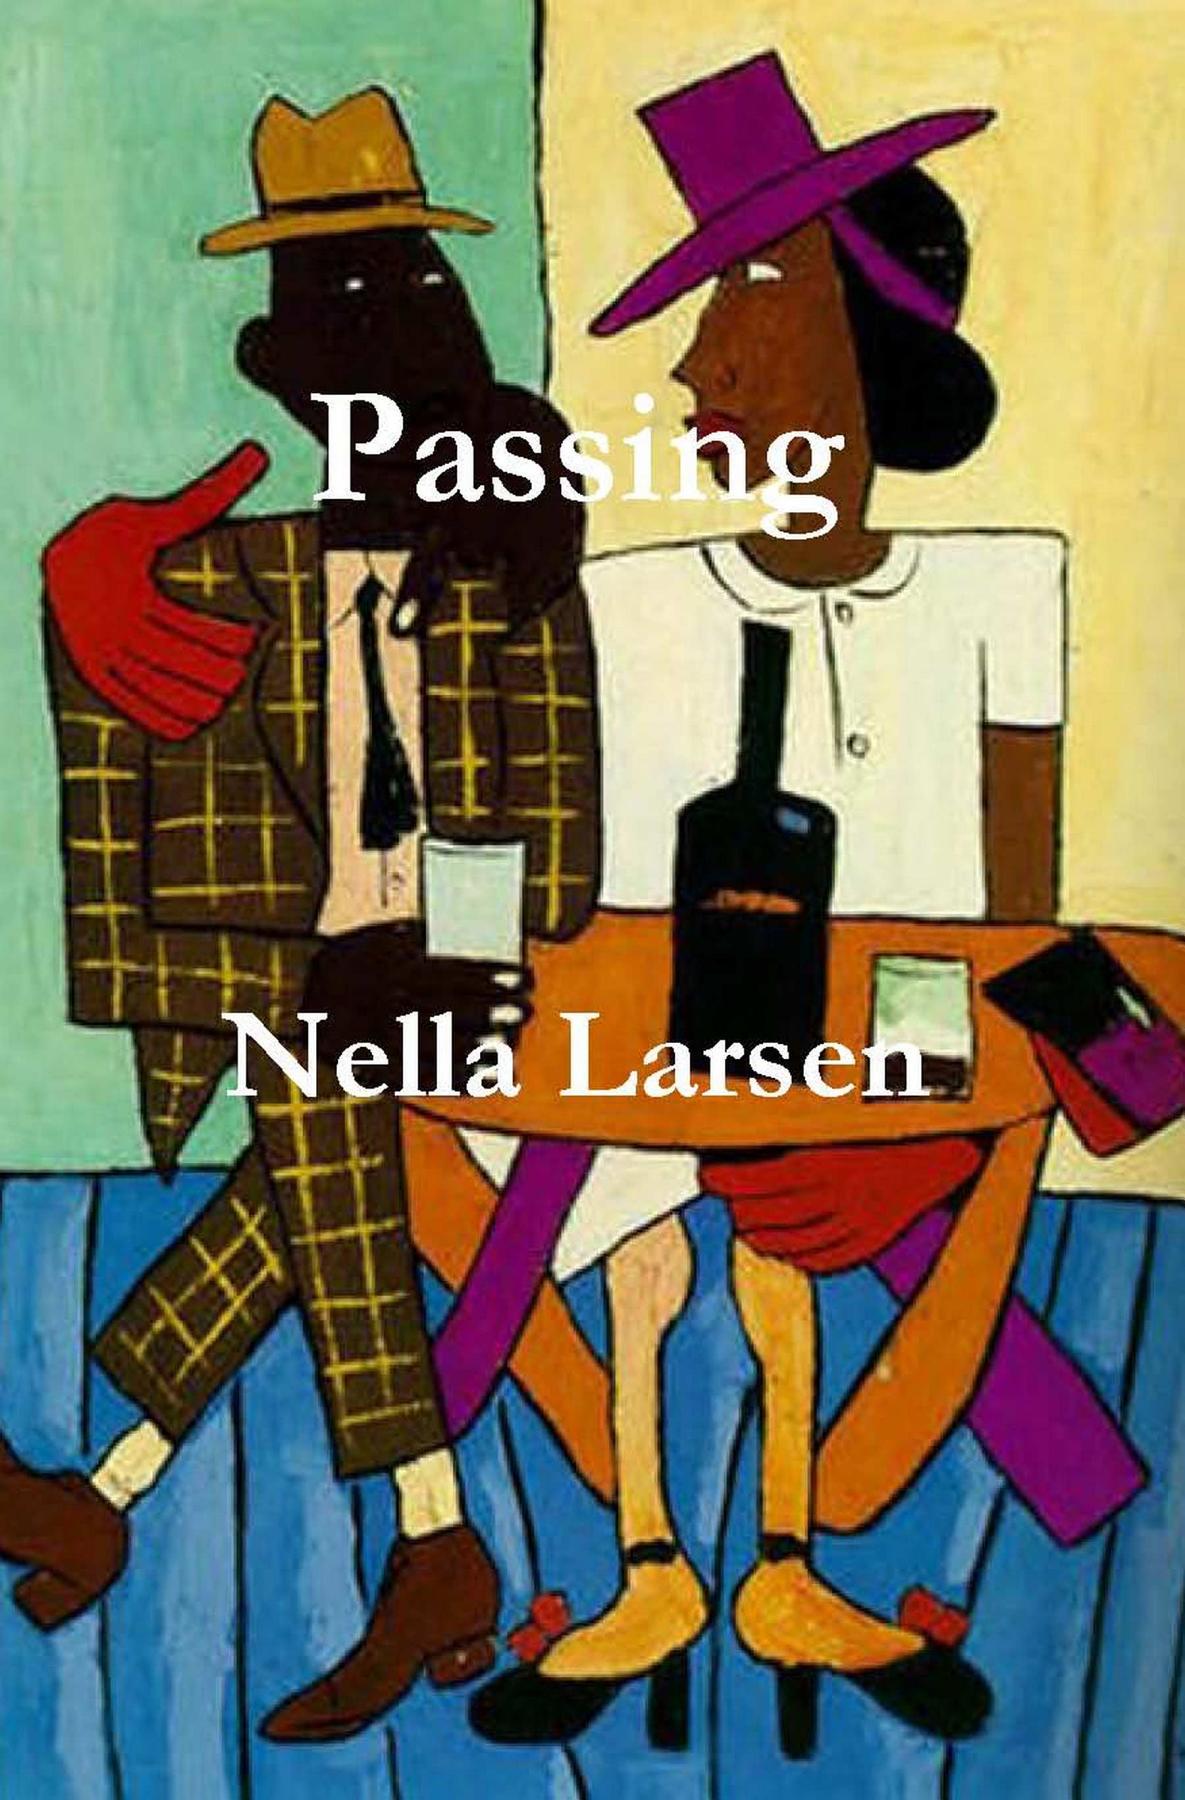 nella larsen passing thesis